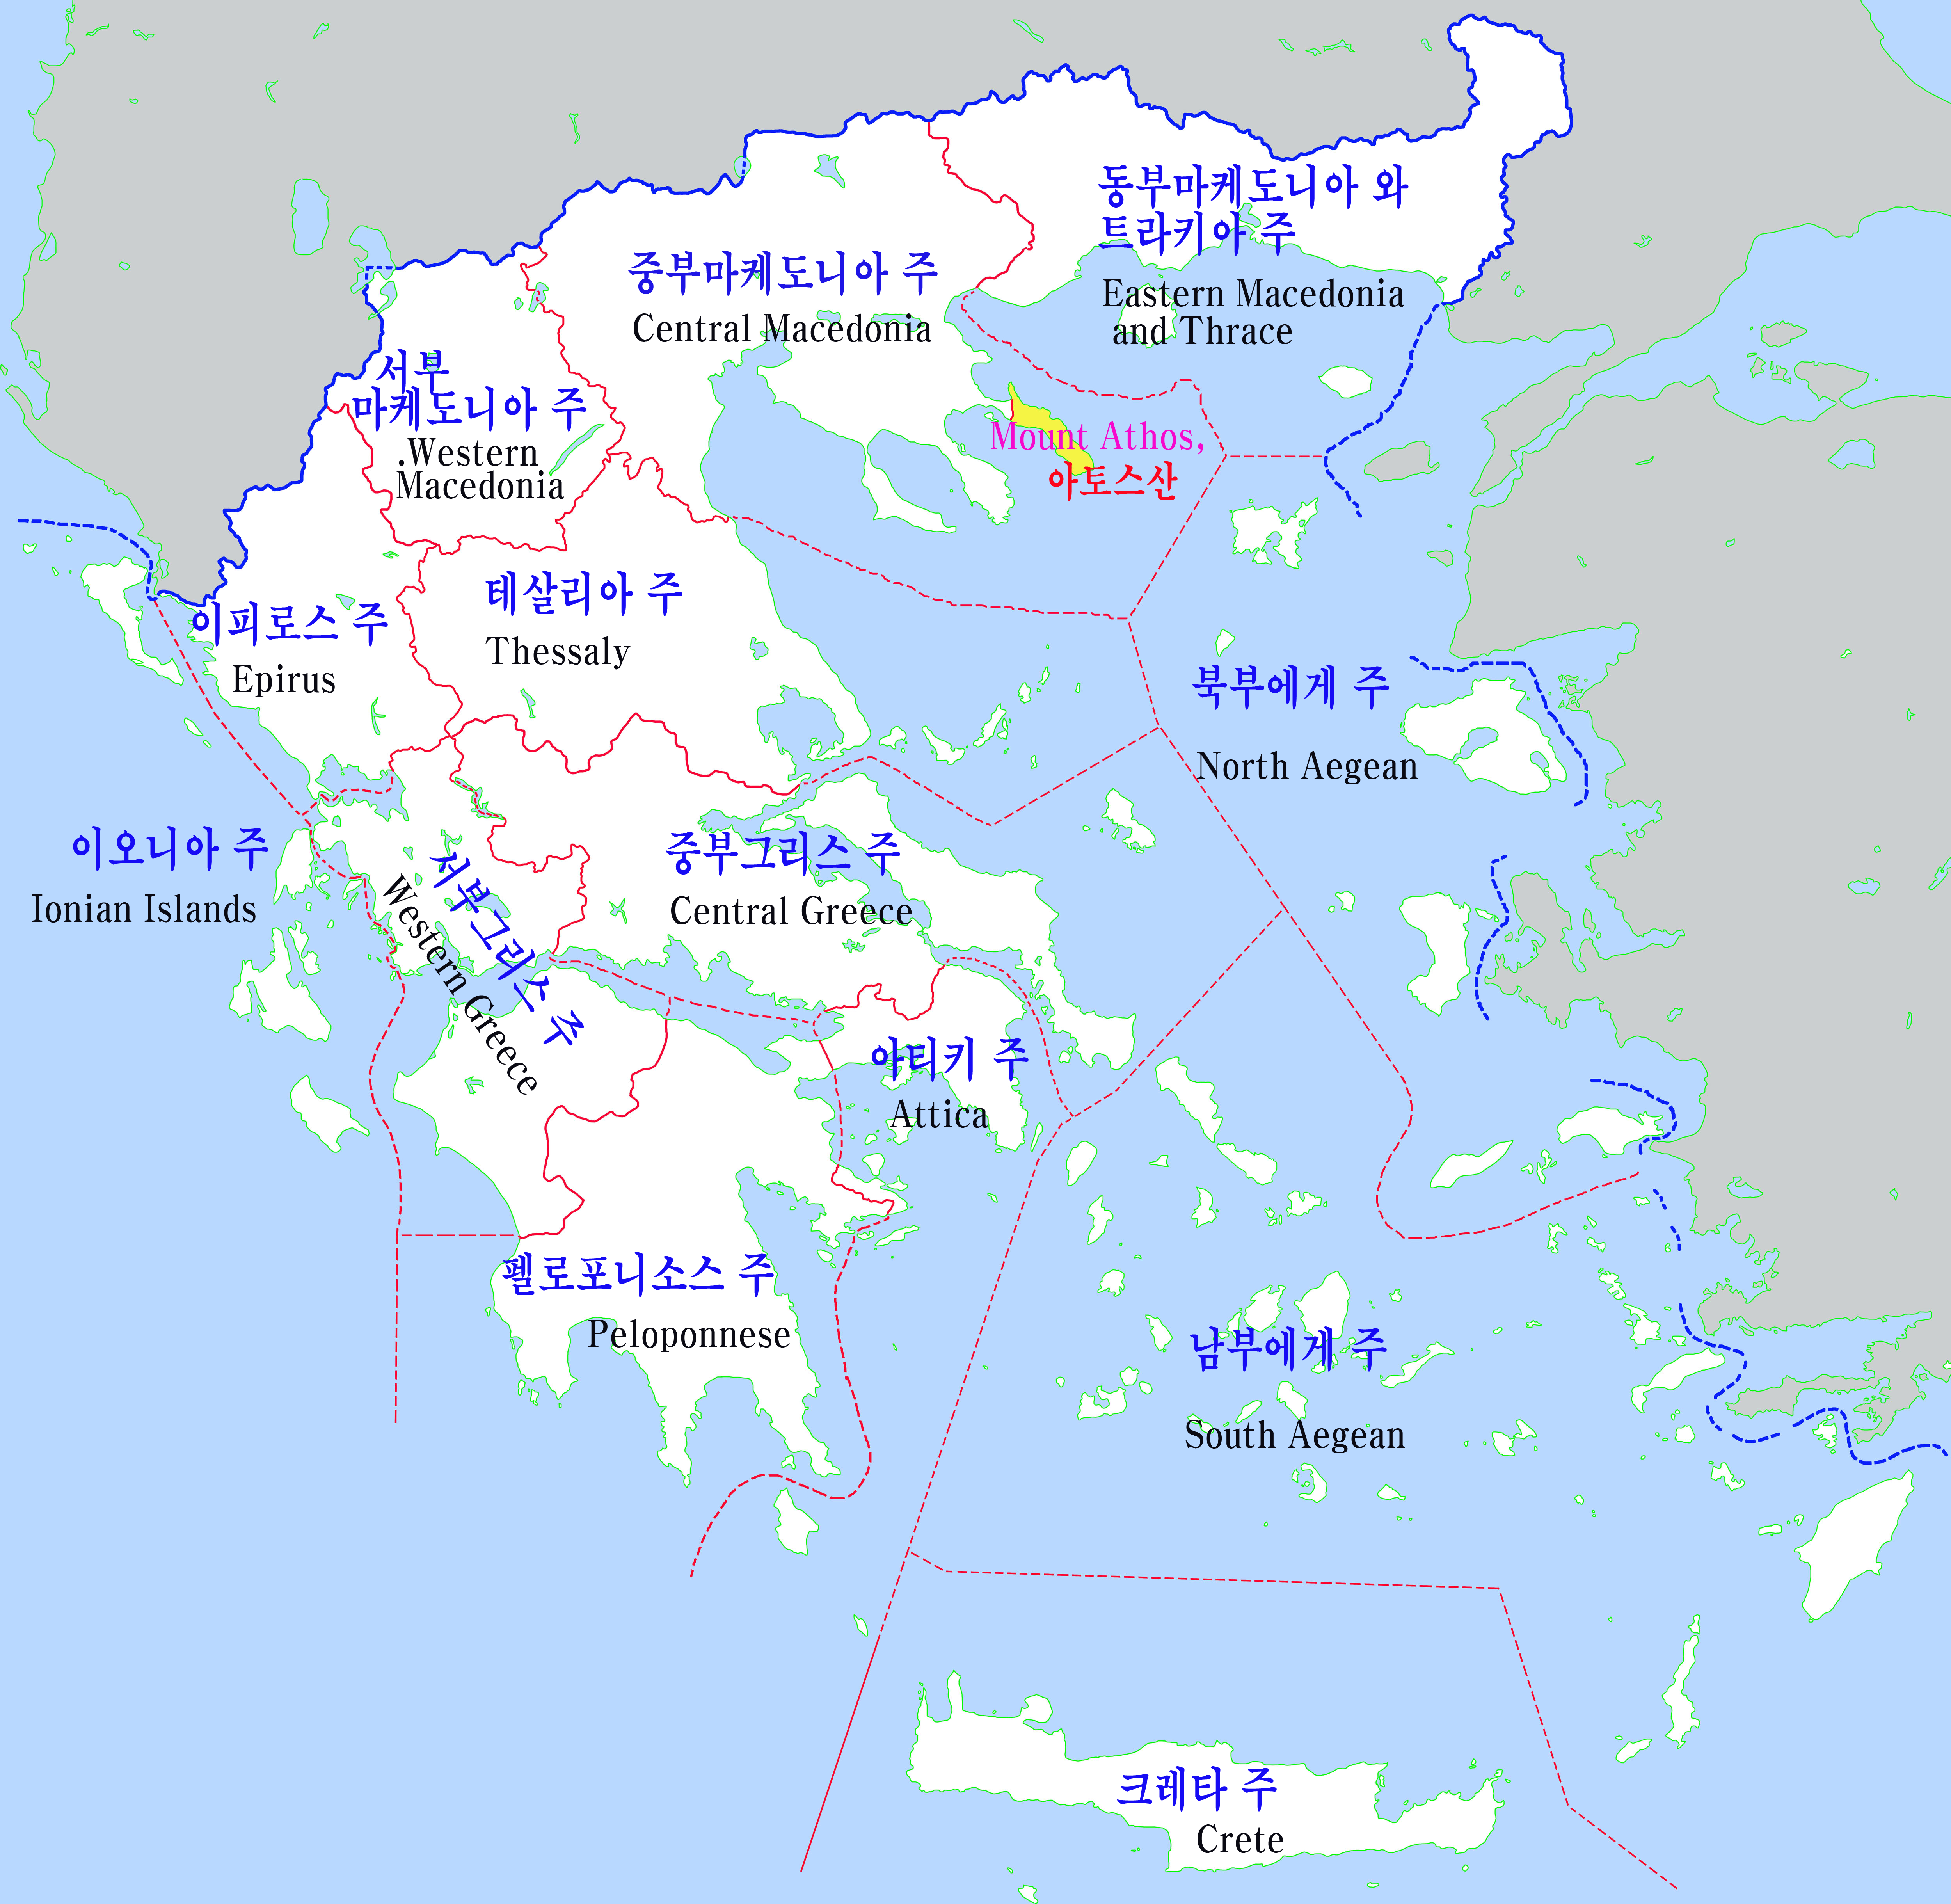 FileGreecemappng Wikimedia Commons - Greece map